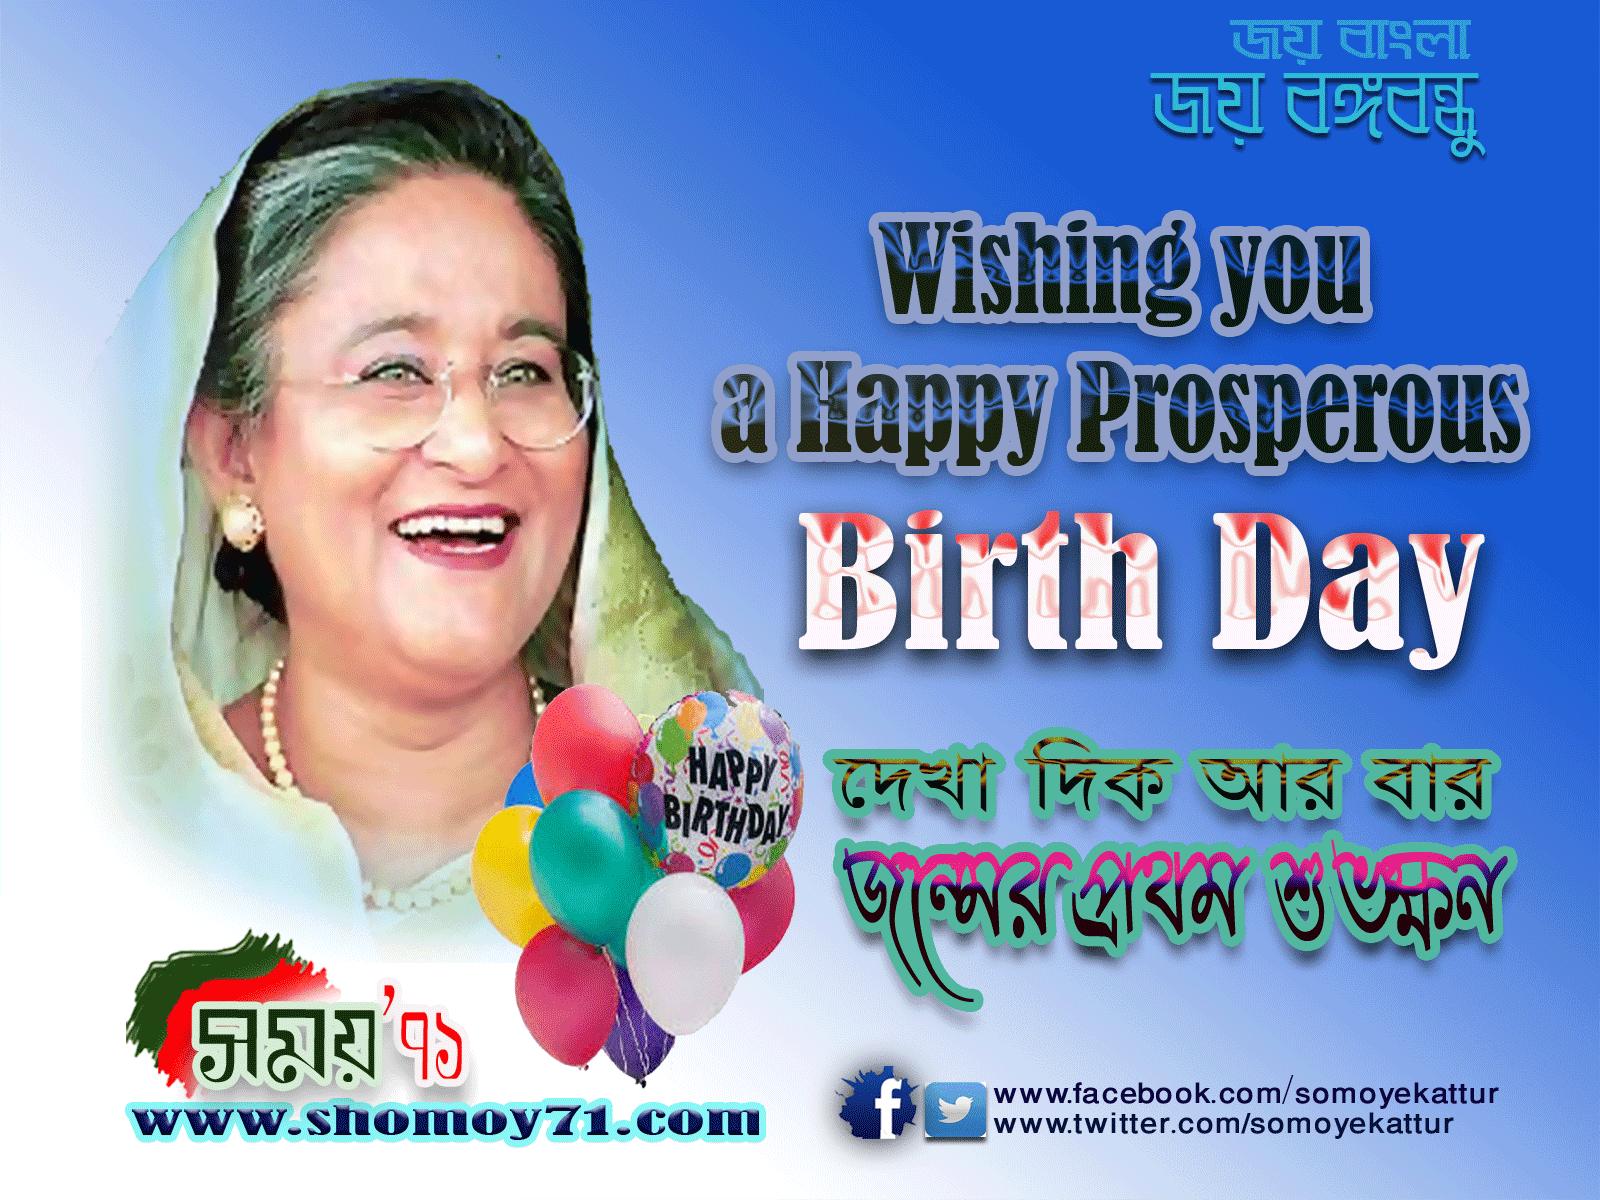 Happy Birth Day to Sheikh Hasina